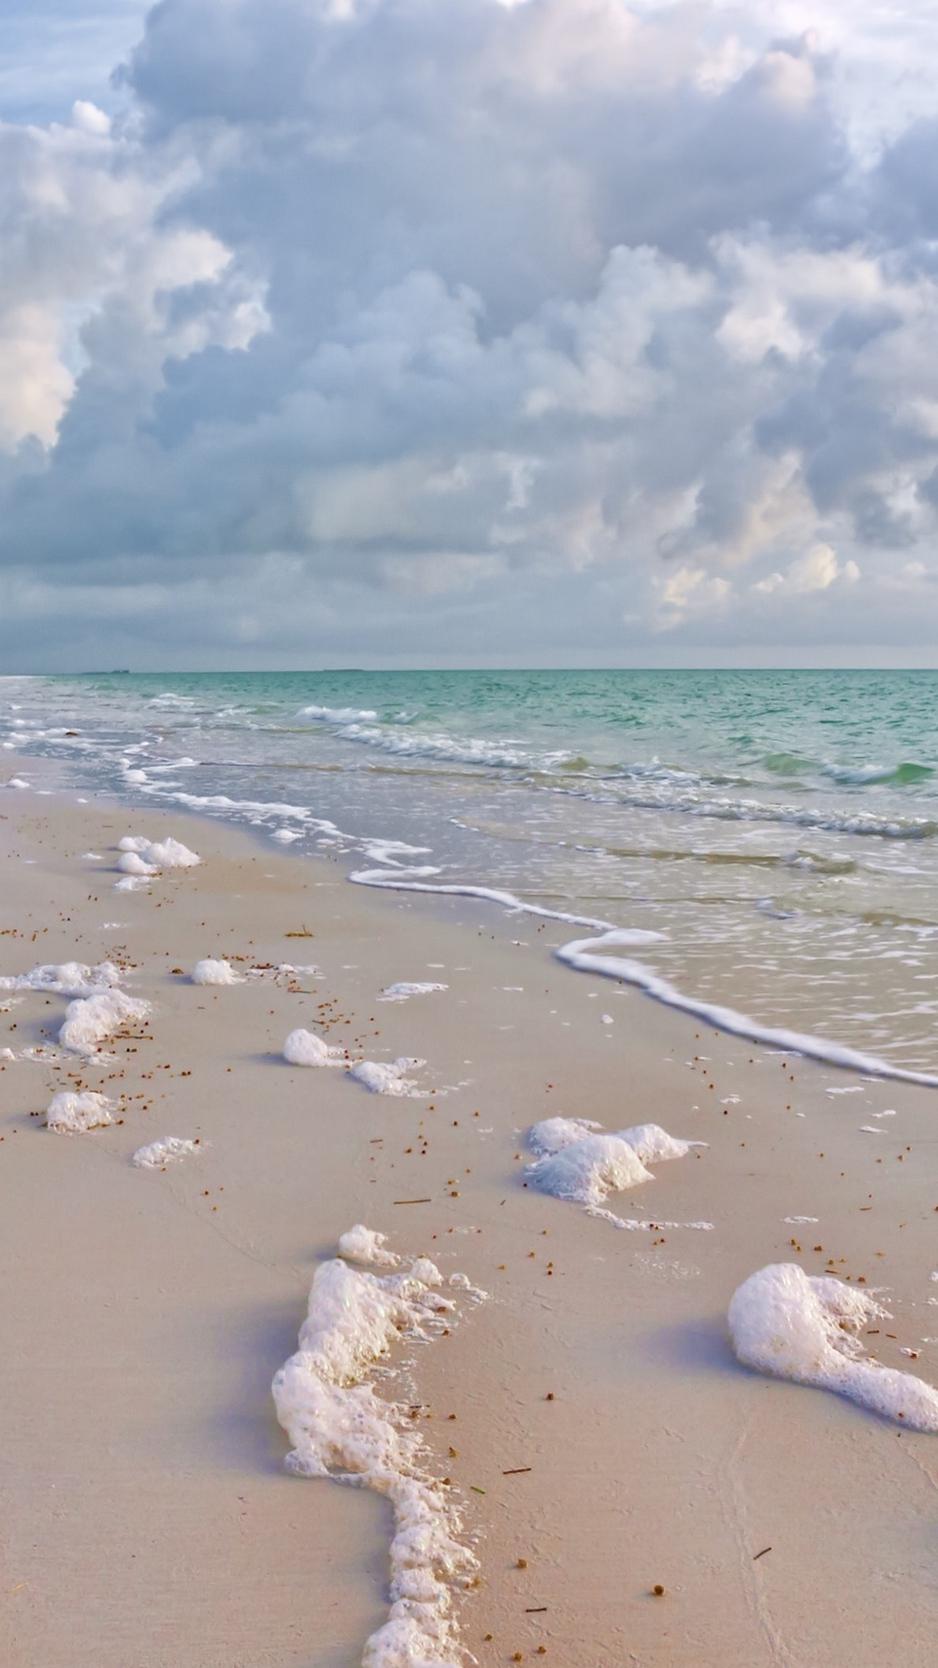 Wallpaper Foam Sea Sand Wet Clouds Surf Whisper Fond D Ecran Iphone Plage 938x1668 Wallpaper Teahub Io